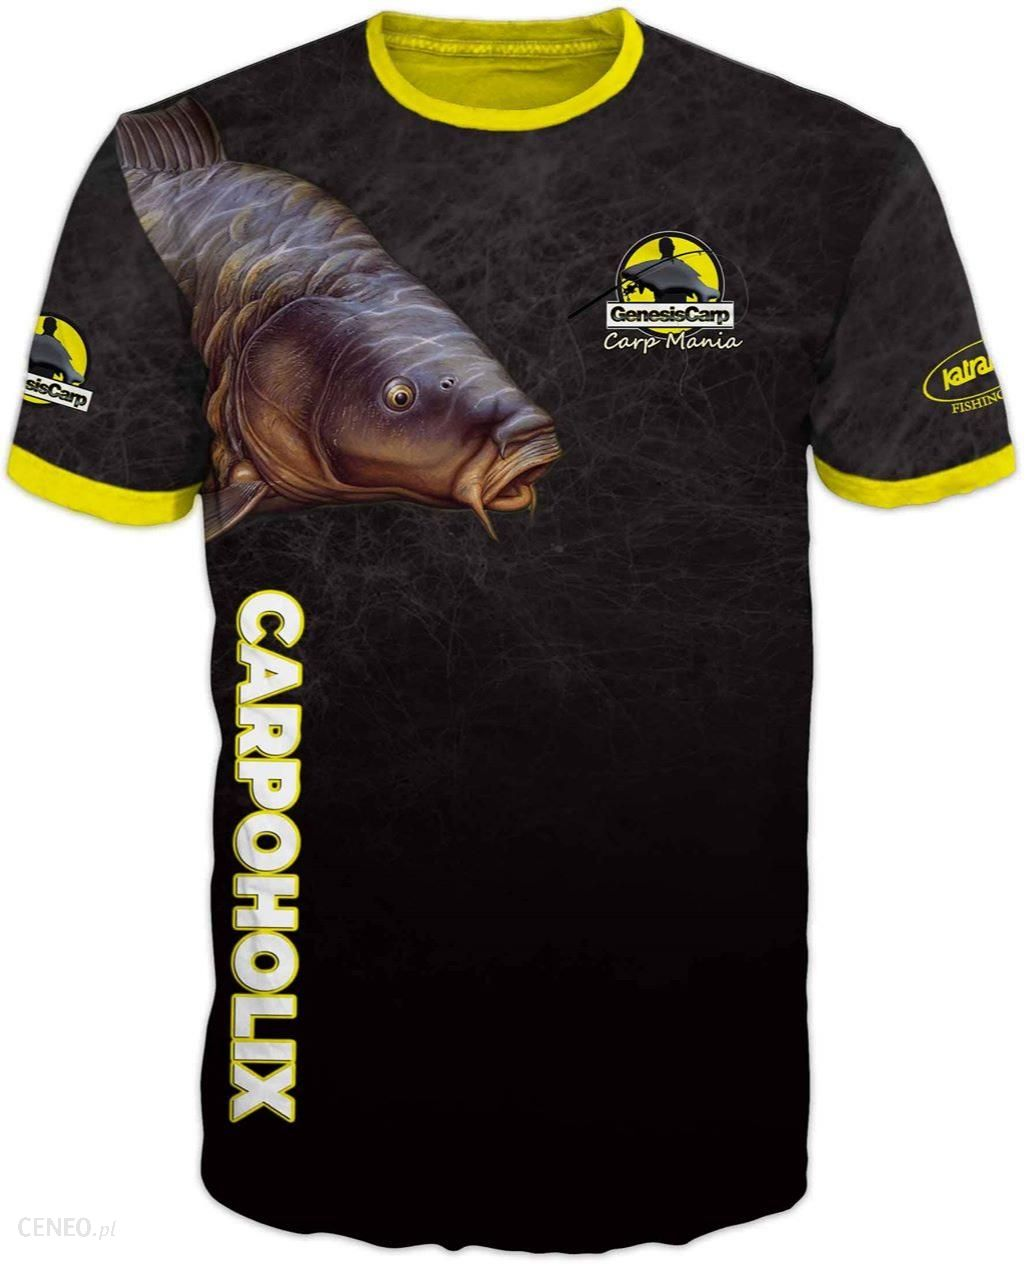 Genesis Carp T-Shirt X2 Xxxl